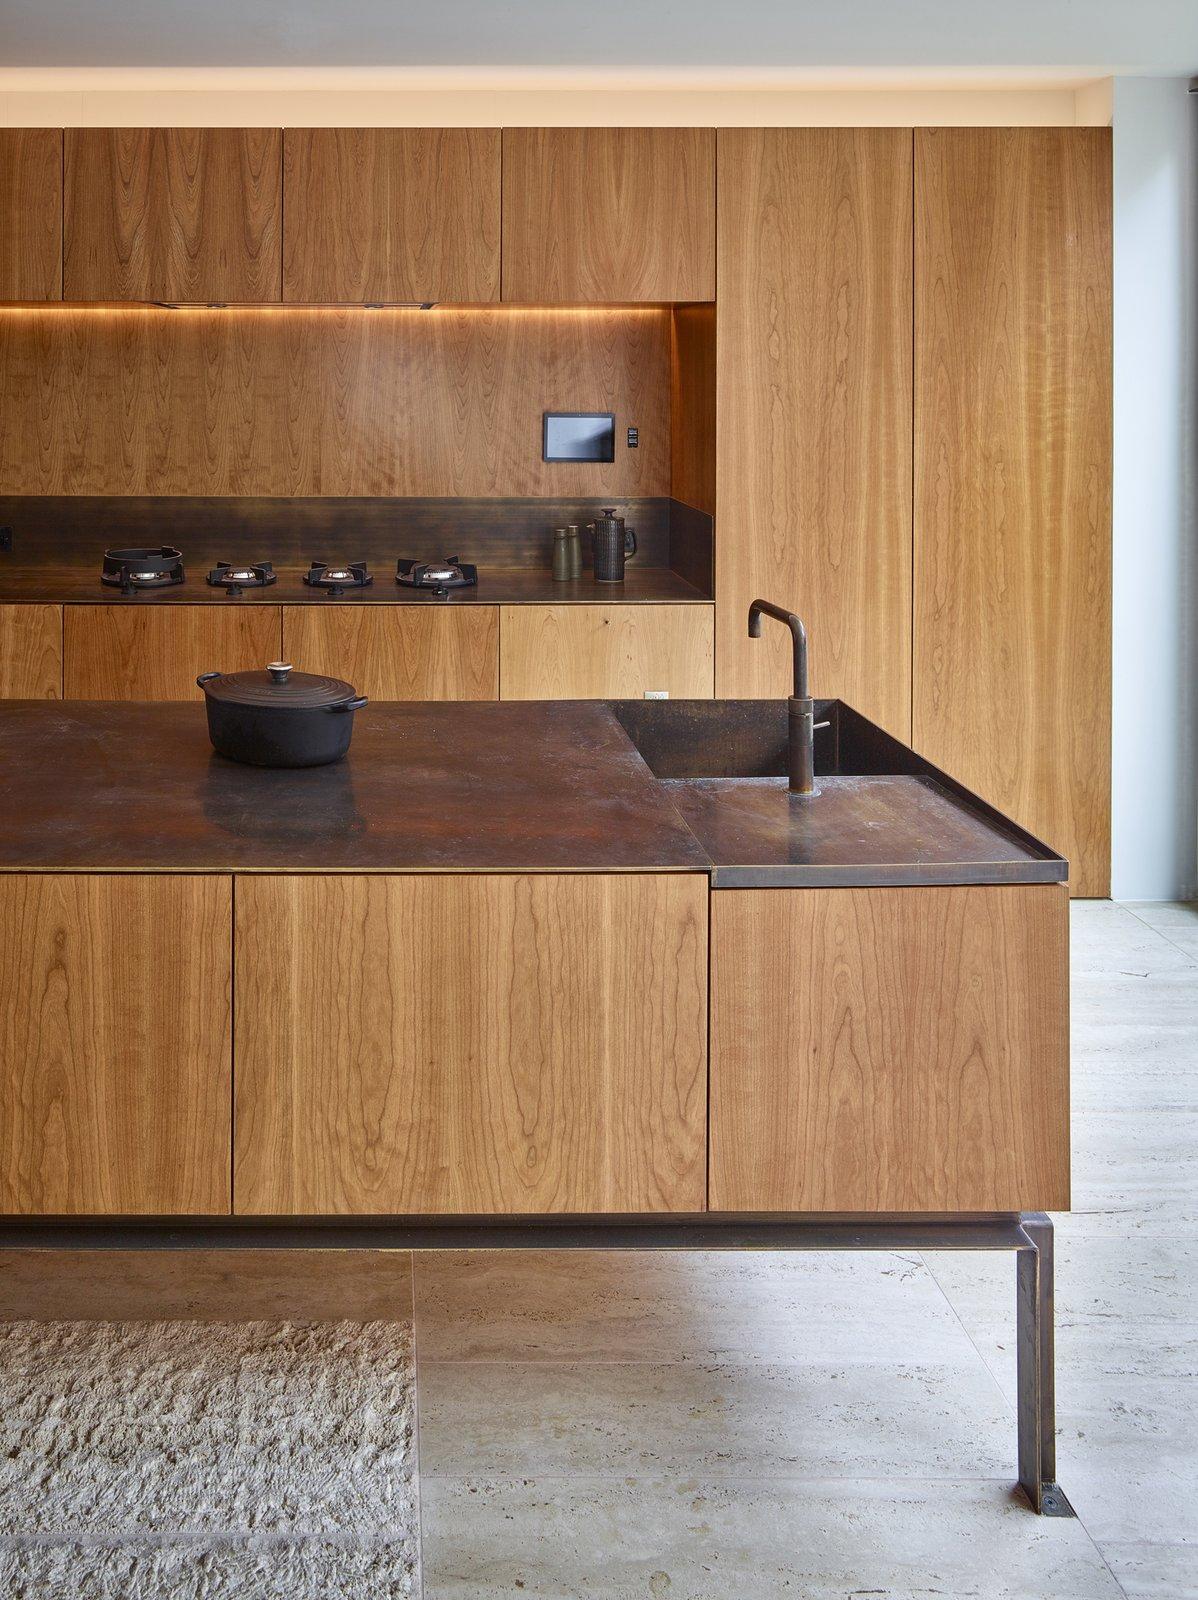 Tagged: Kitchen, Wood Cabinet, Wood Counter, Wood Backsplashe, Concrete Floor, Range, and Undermount Sink. Caroline Place by Leibal